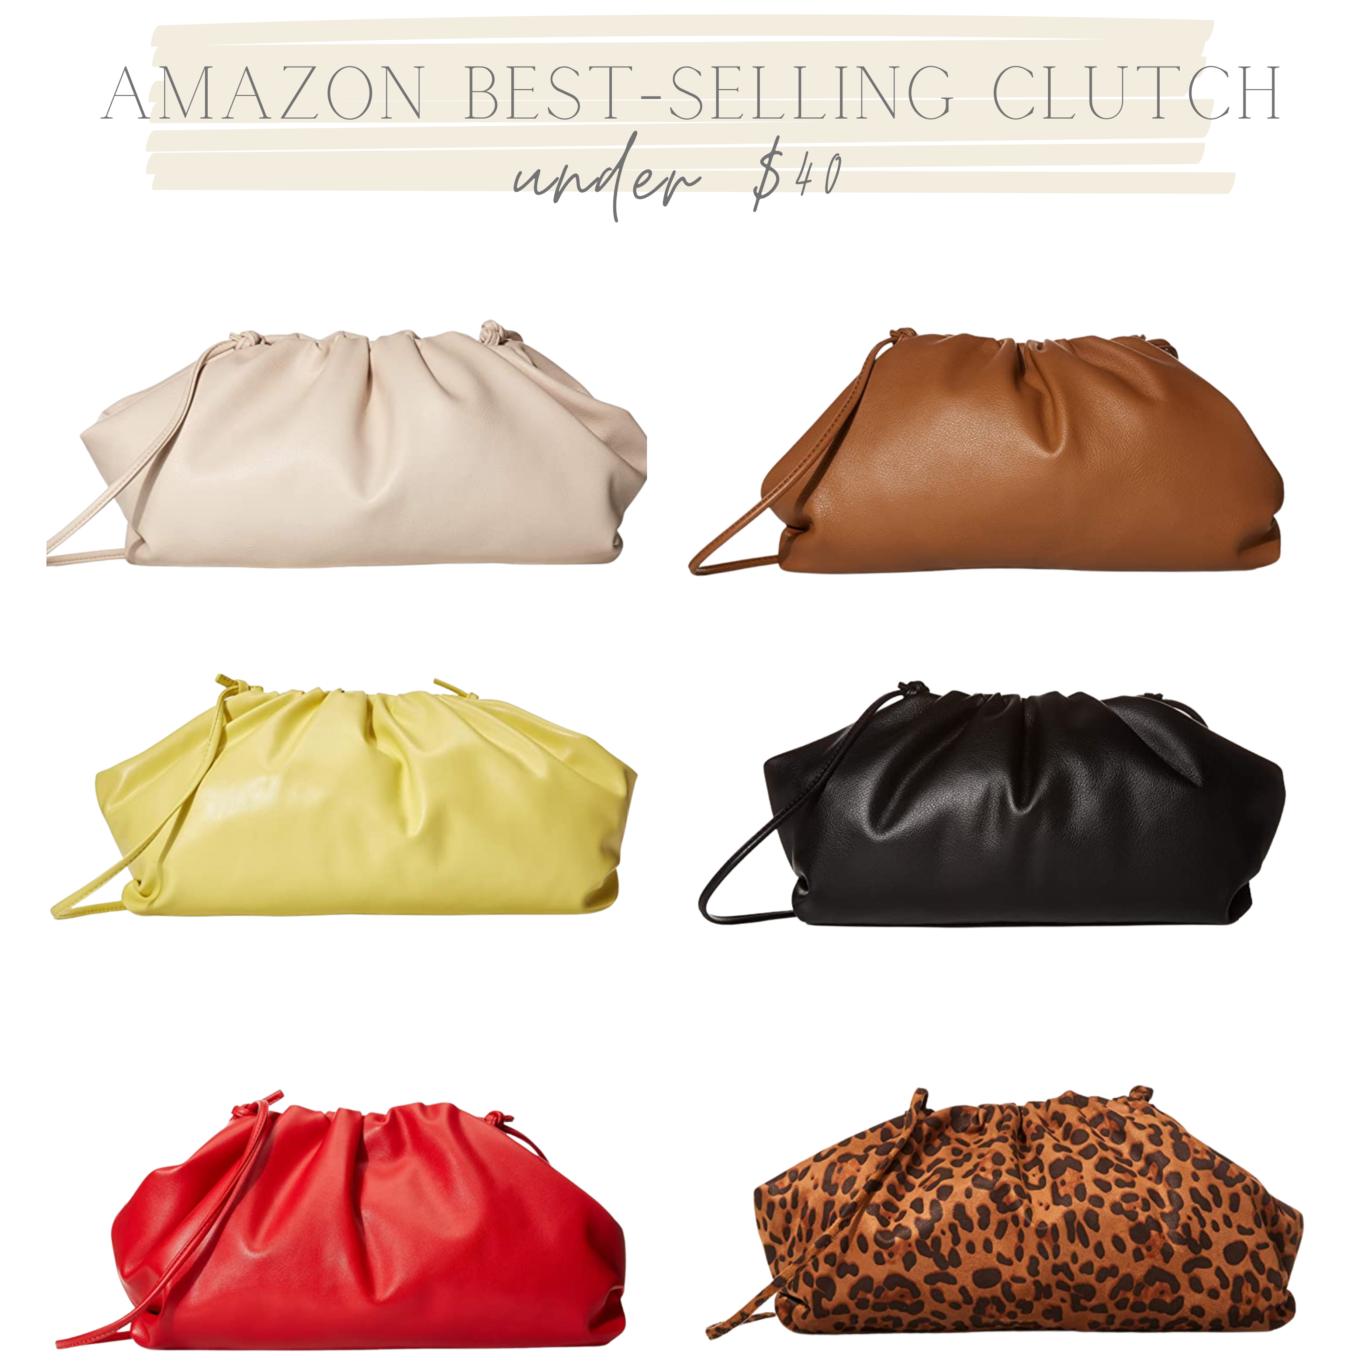 clutch, amazon, best-selling clutch, designer dupe, designer dupe clutch